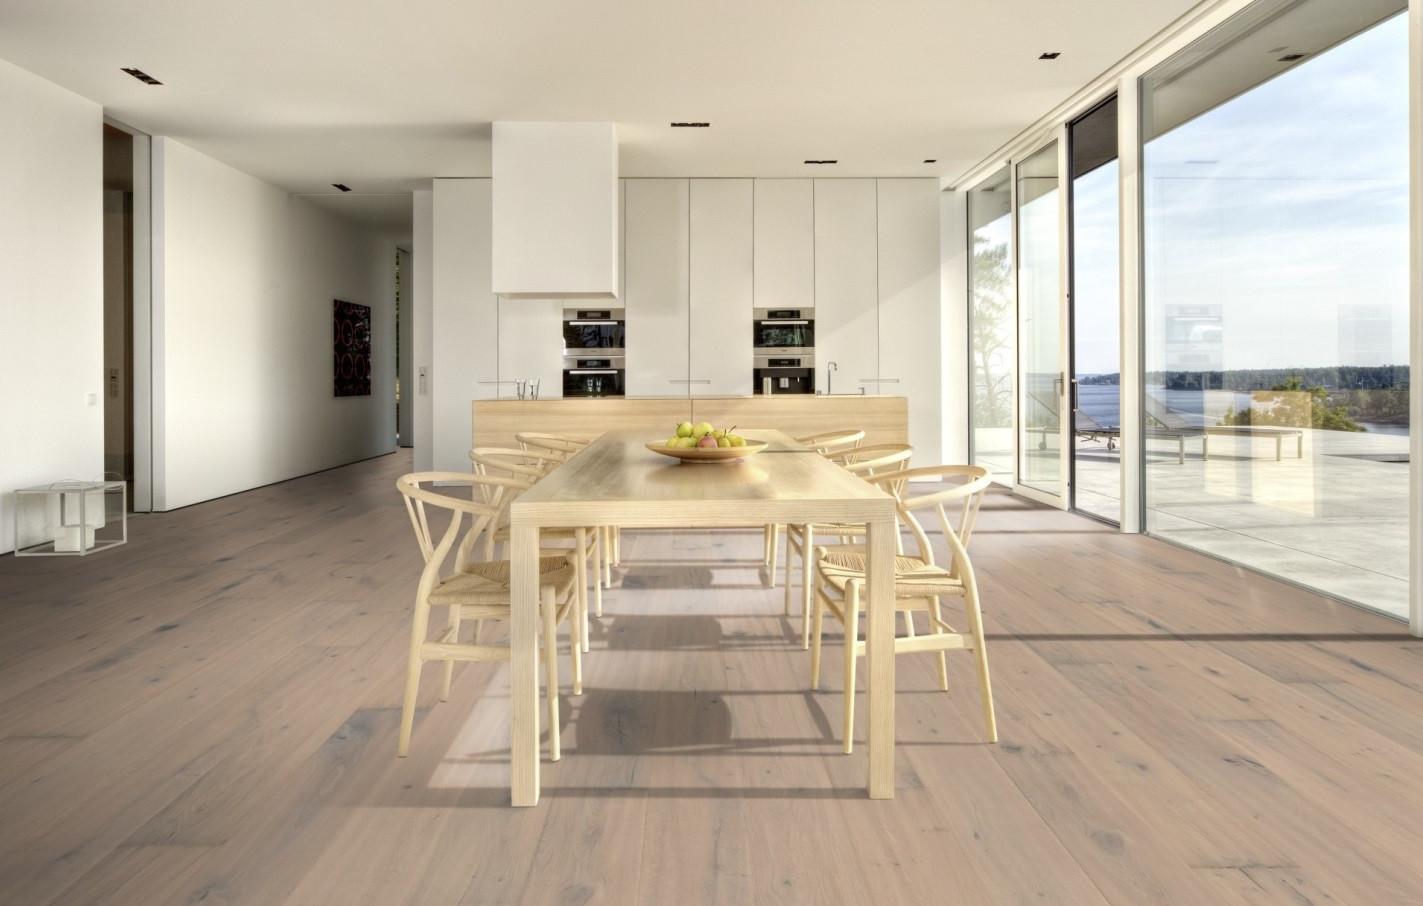 21 Famous Kahrs Hardwood Flooring Distributors 2021 free download kahrs hardwood flooring distributors of stavbaweb cz rustikalnac2ad dekory dac299evac29bnac2bdch podlah kac2a4hrs domani for dac299evac29bna podlaha kac2a4hrs kolekce domani dekor dub